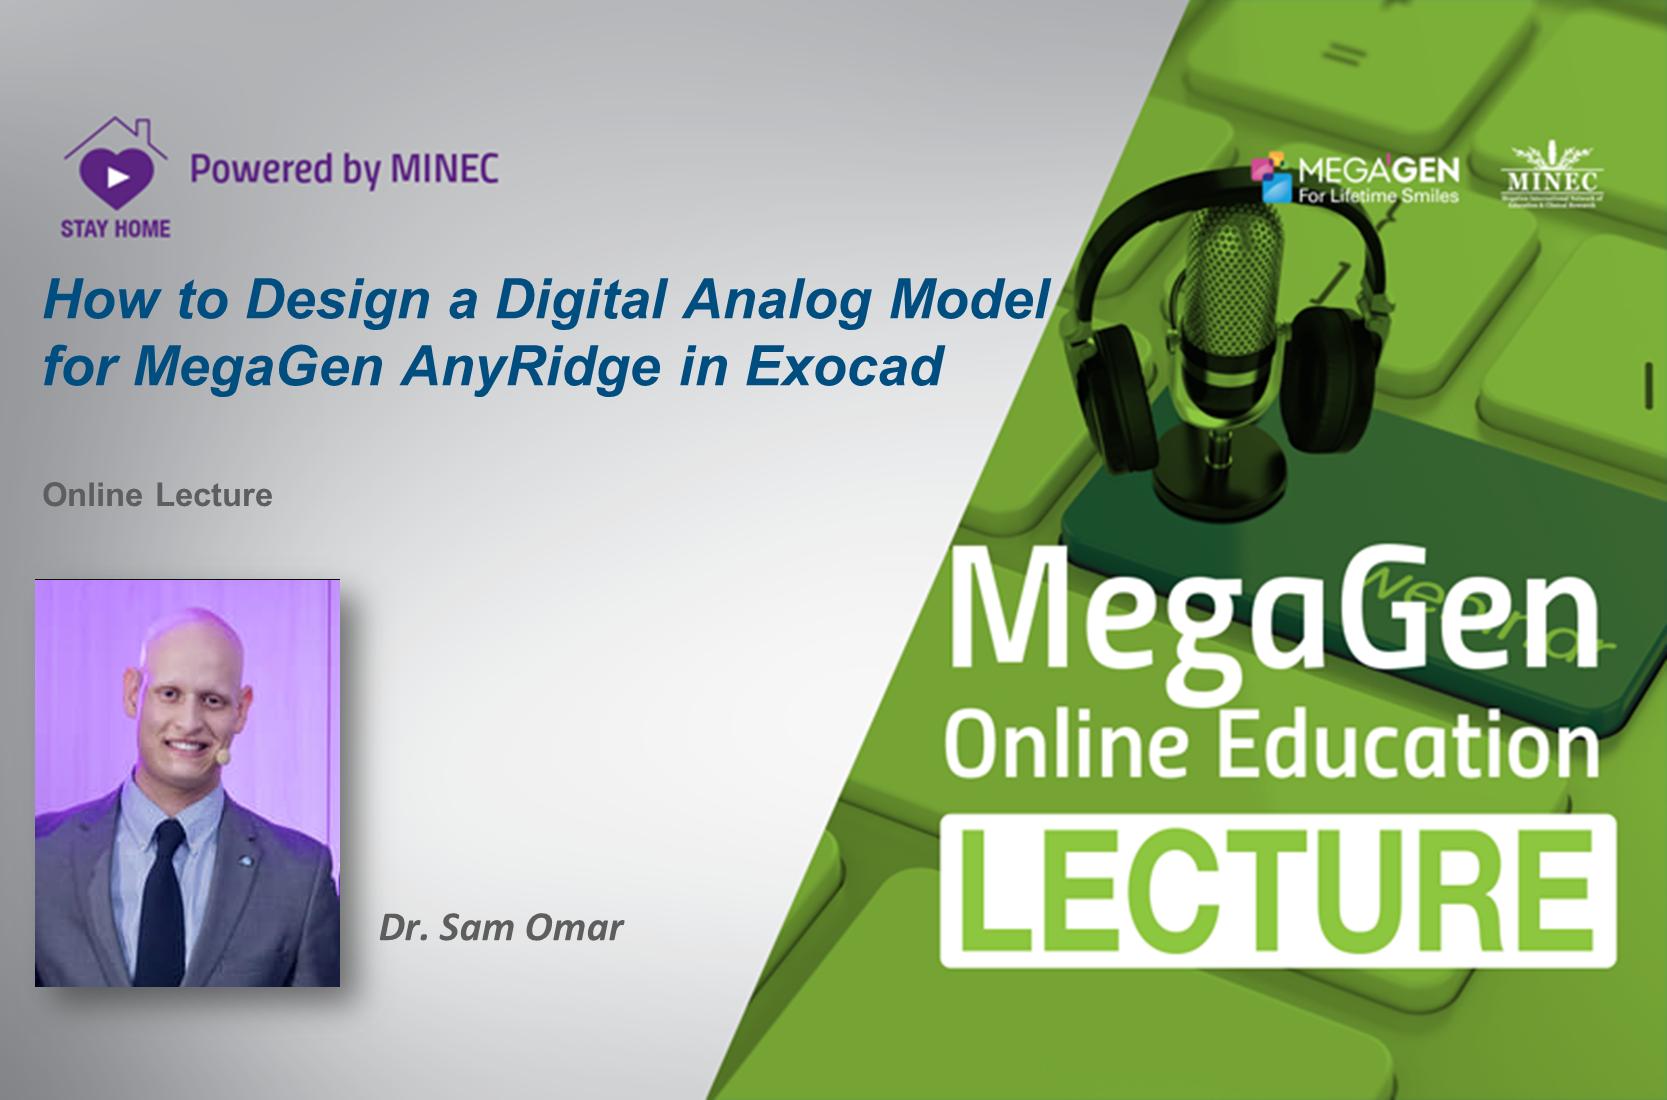 How to design a Digital analog model for Megagen AnyRidge in Exocad